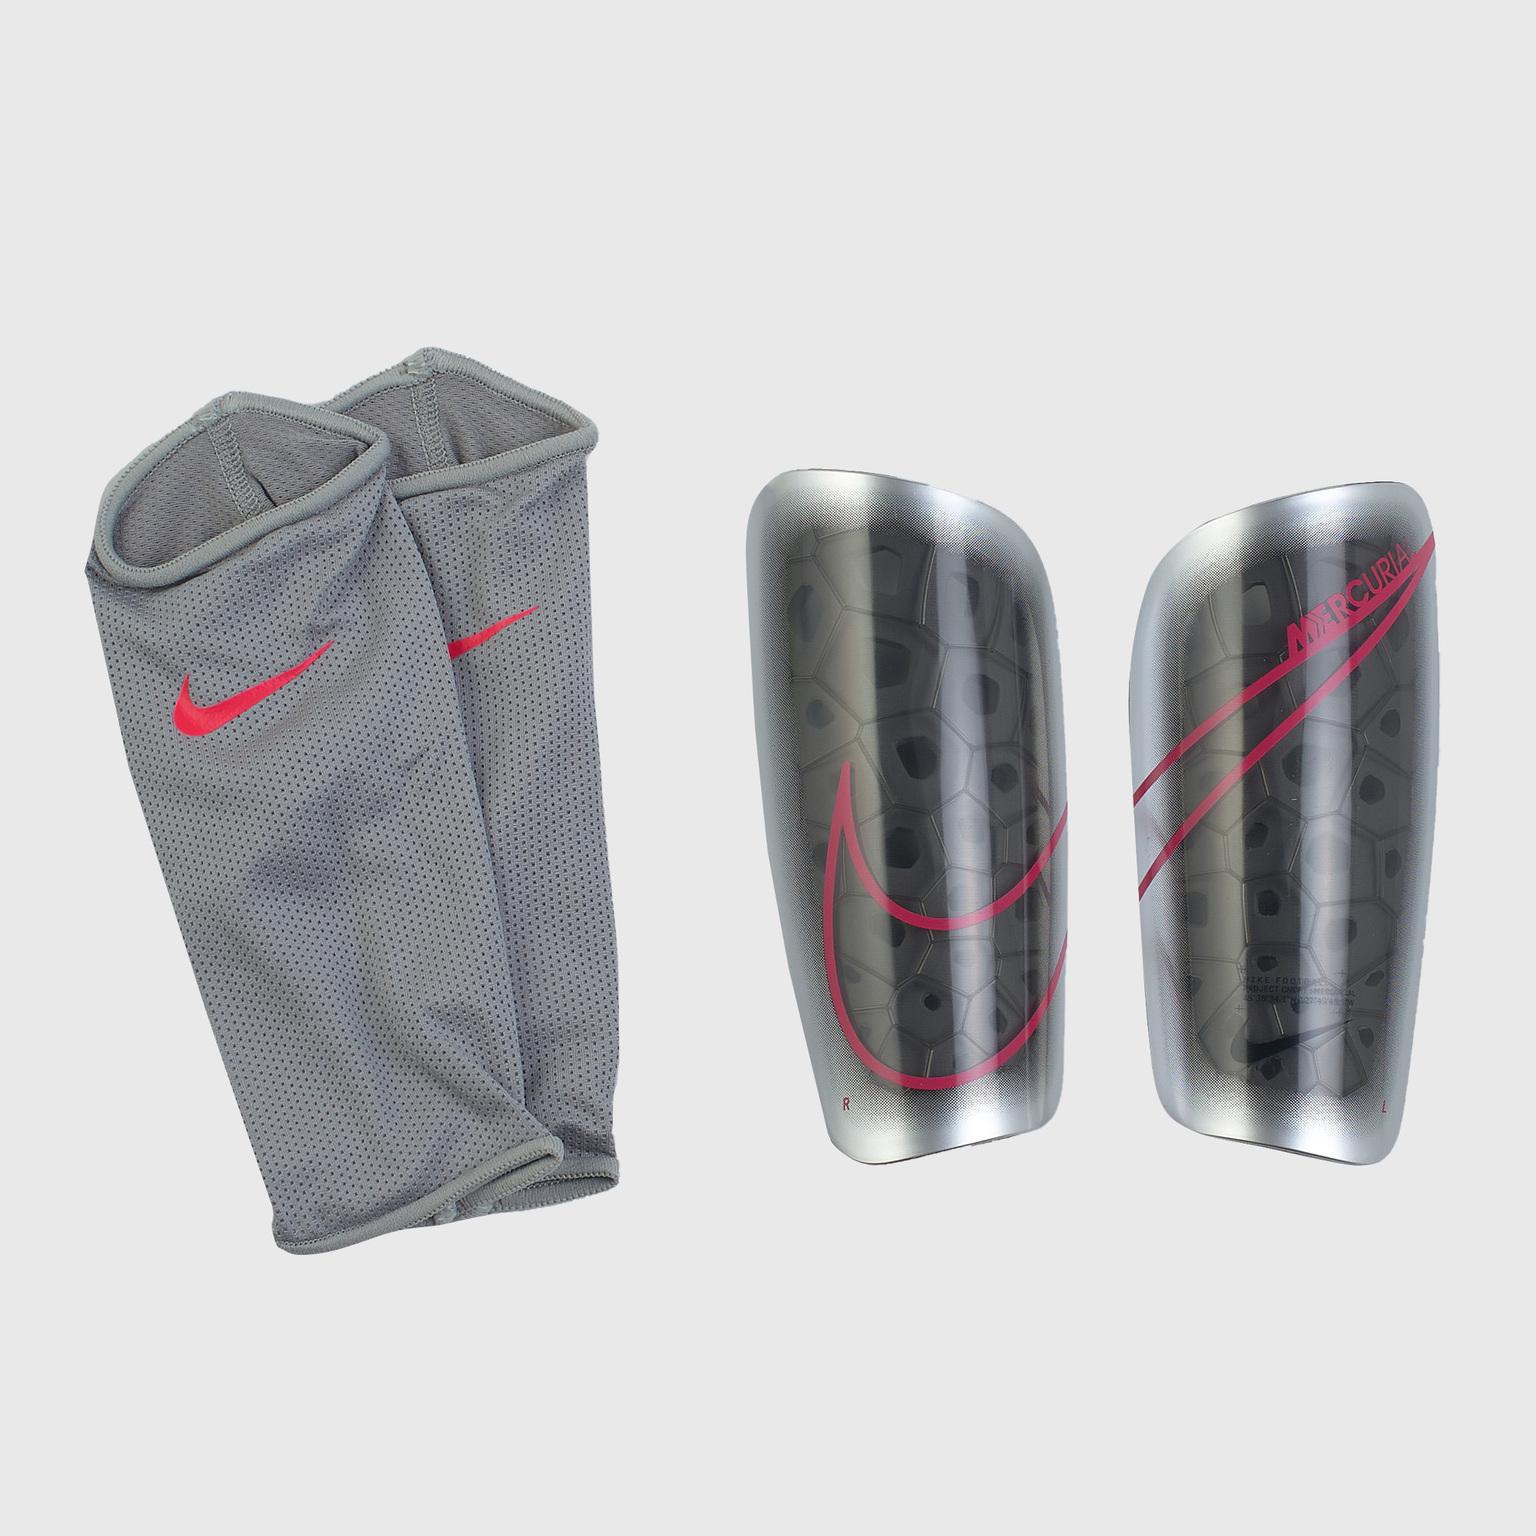 Щитки Nike Mercurial Lite GRD SP2120-095 щитки nike mercurial lite grd sp2120 704